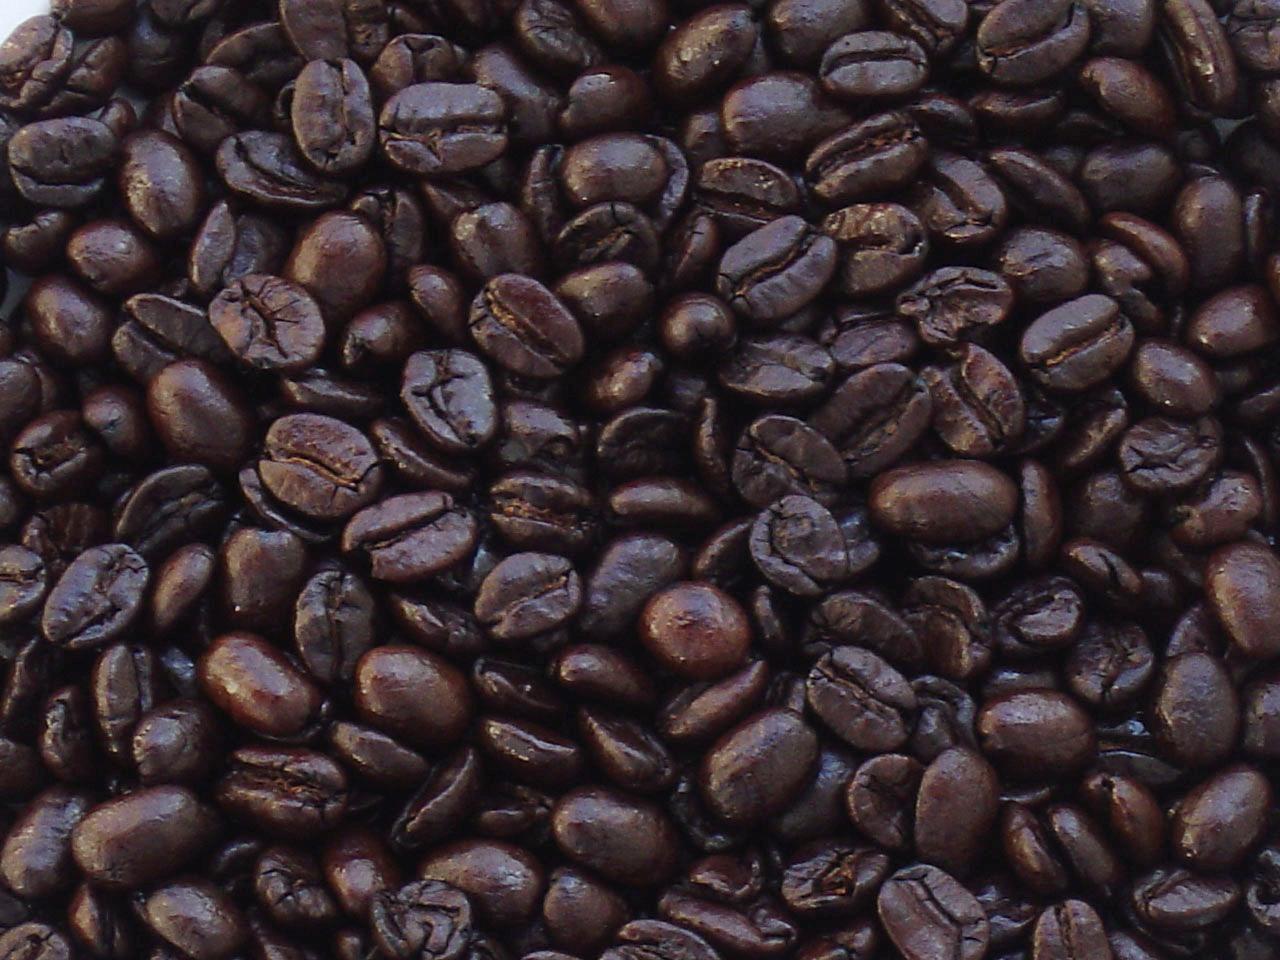 kopi arang